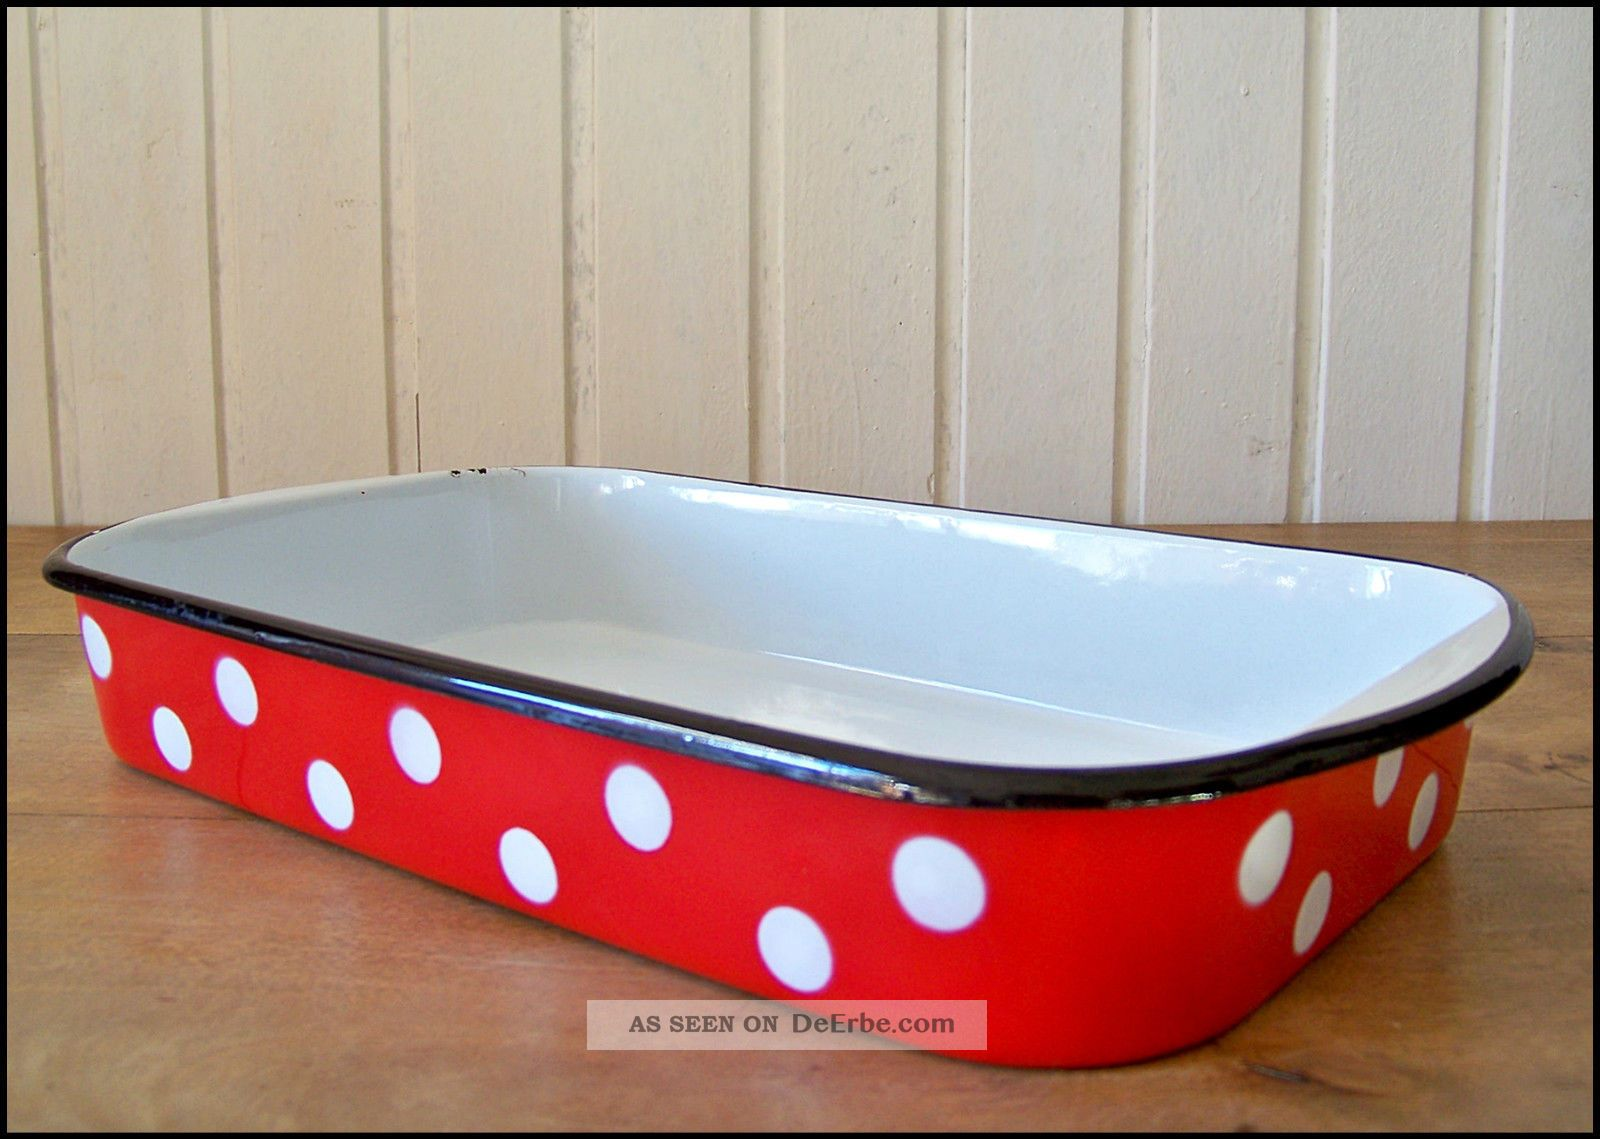 emaillierte auflaufform rot weiss getupft email ofen vintage enamel oven dish. Black Bedroom Furniture Sets. Home Design Ideas